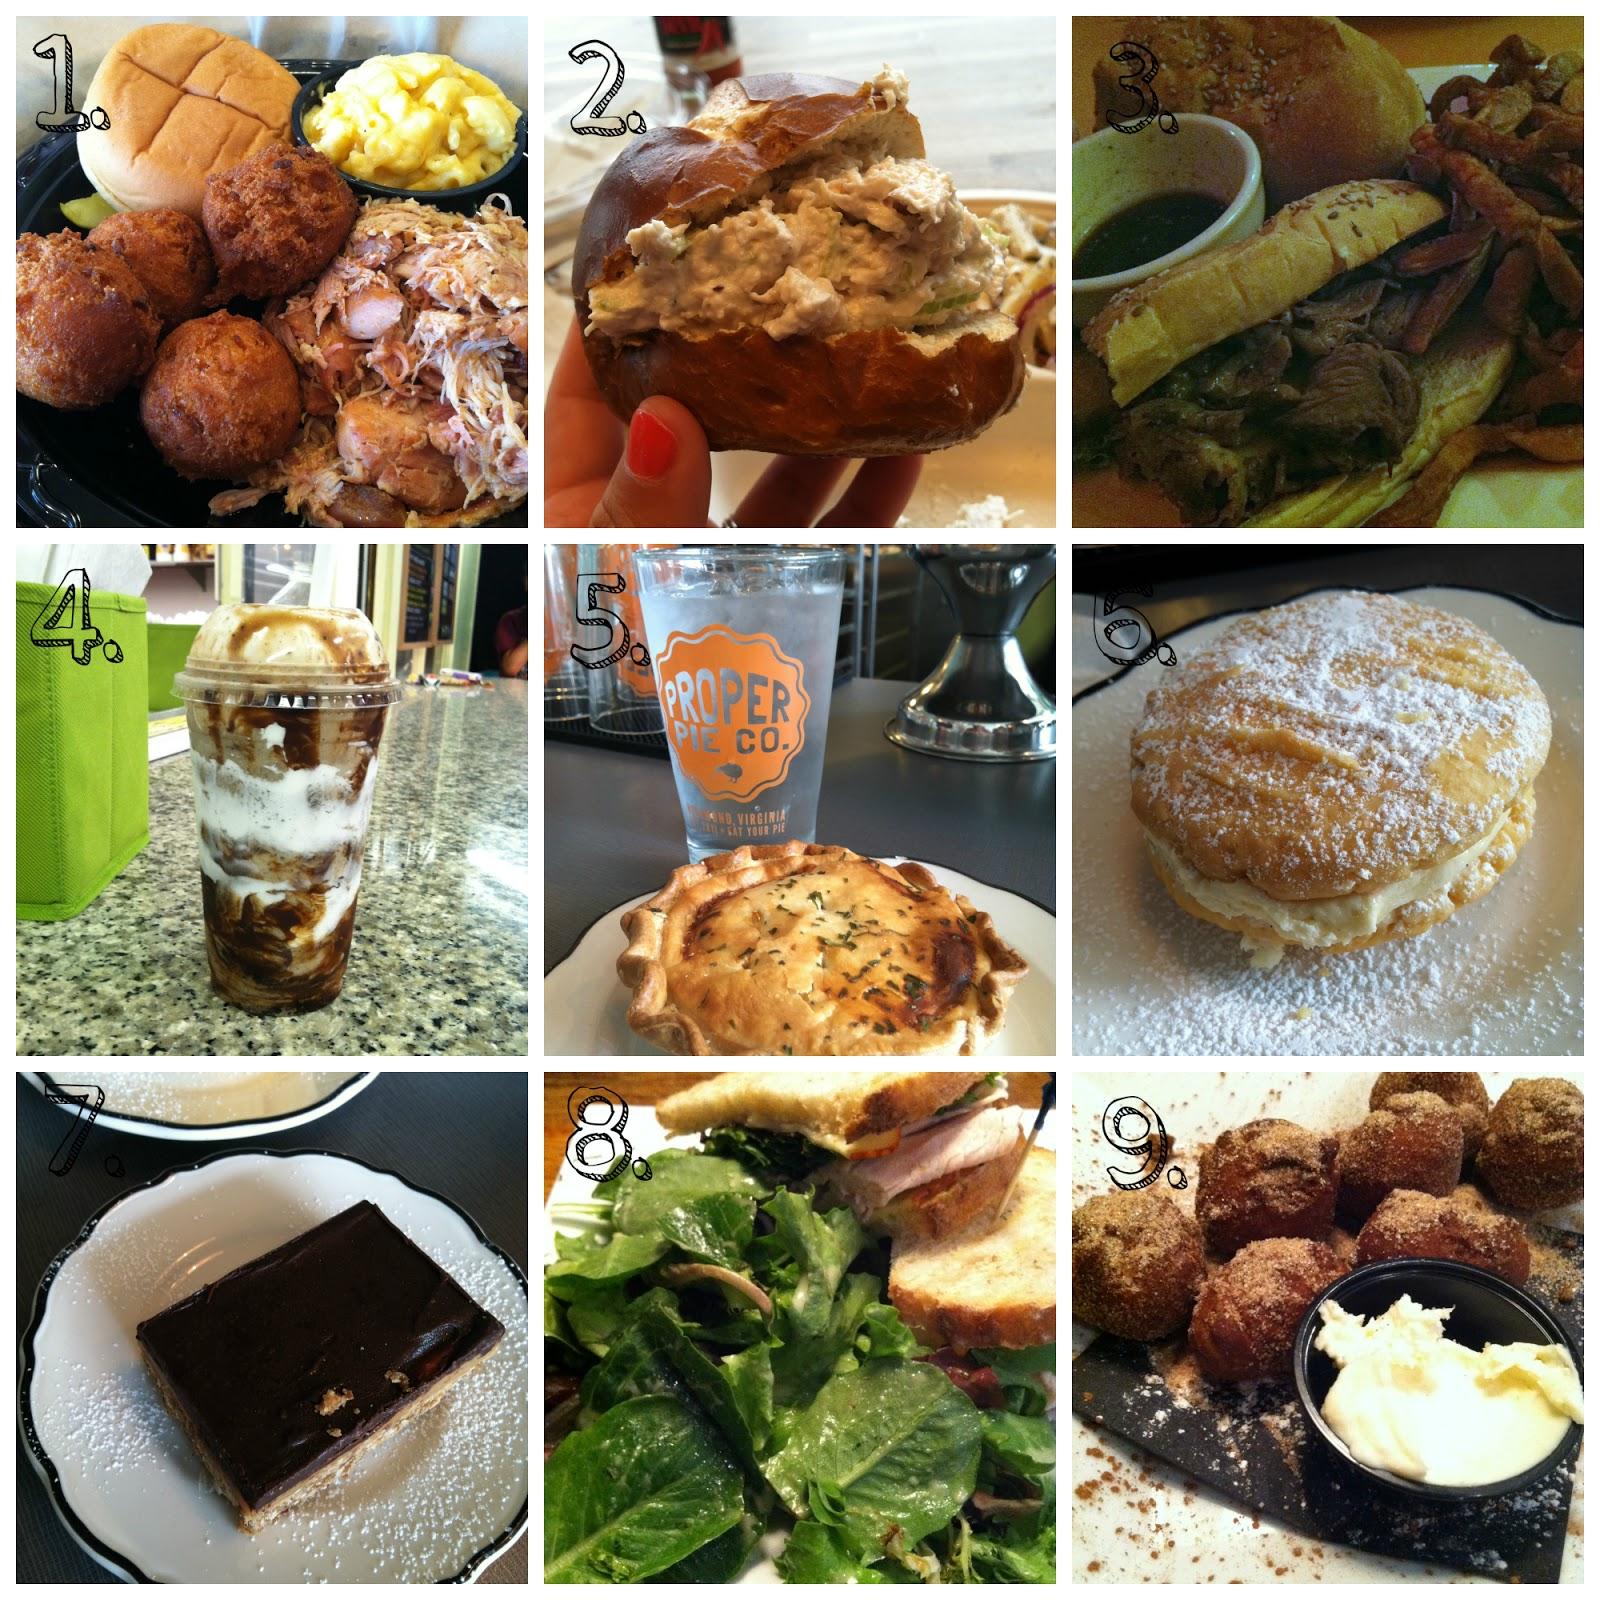 Golden Corral Prices Buffet Menu, Breakfast Hours - 2017